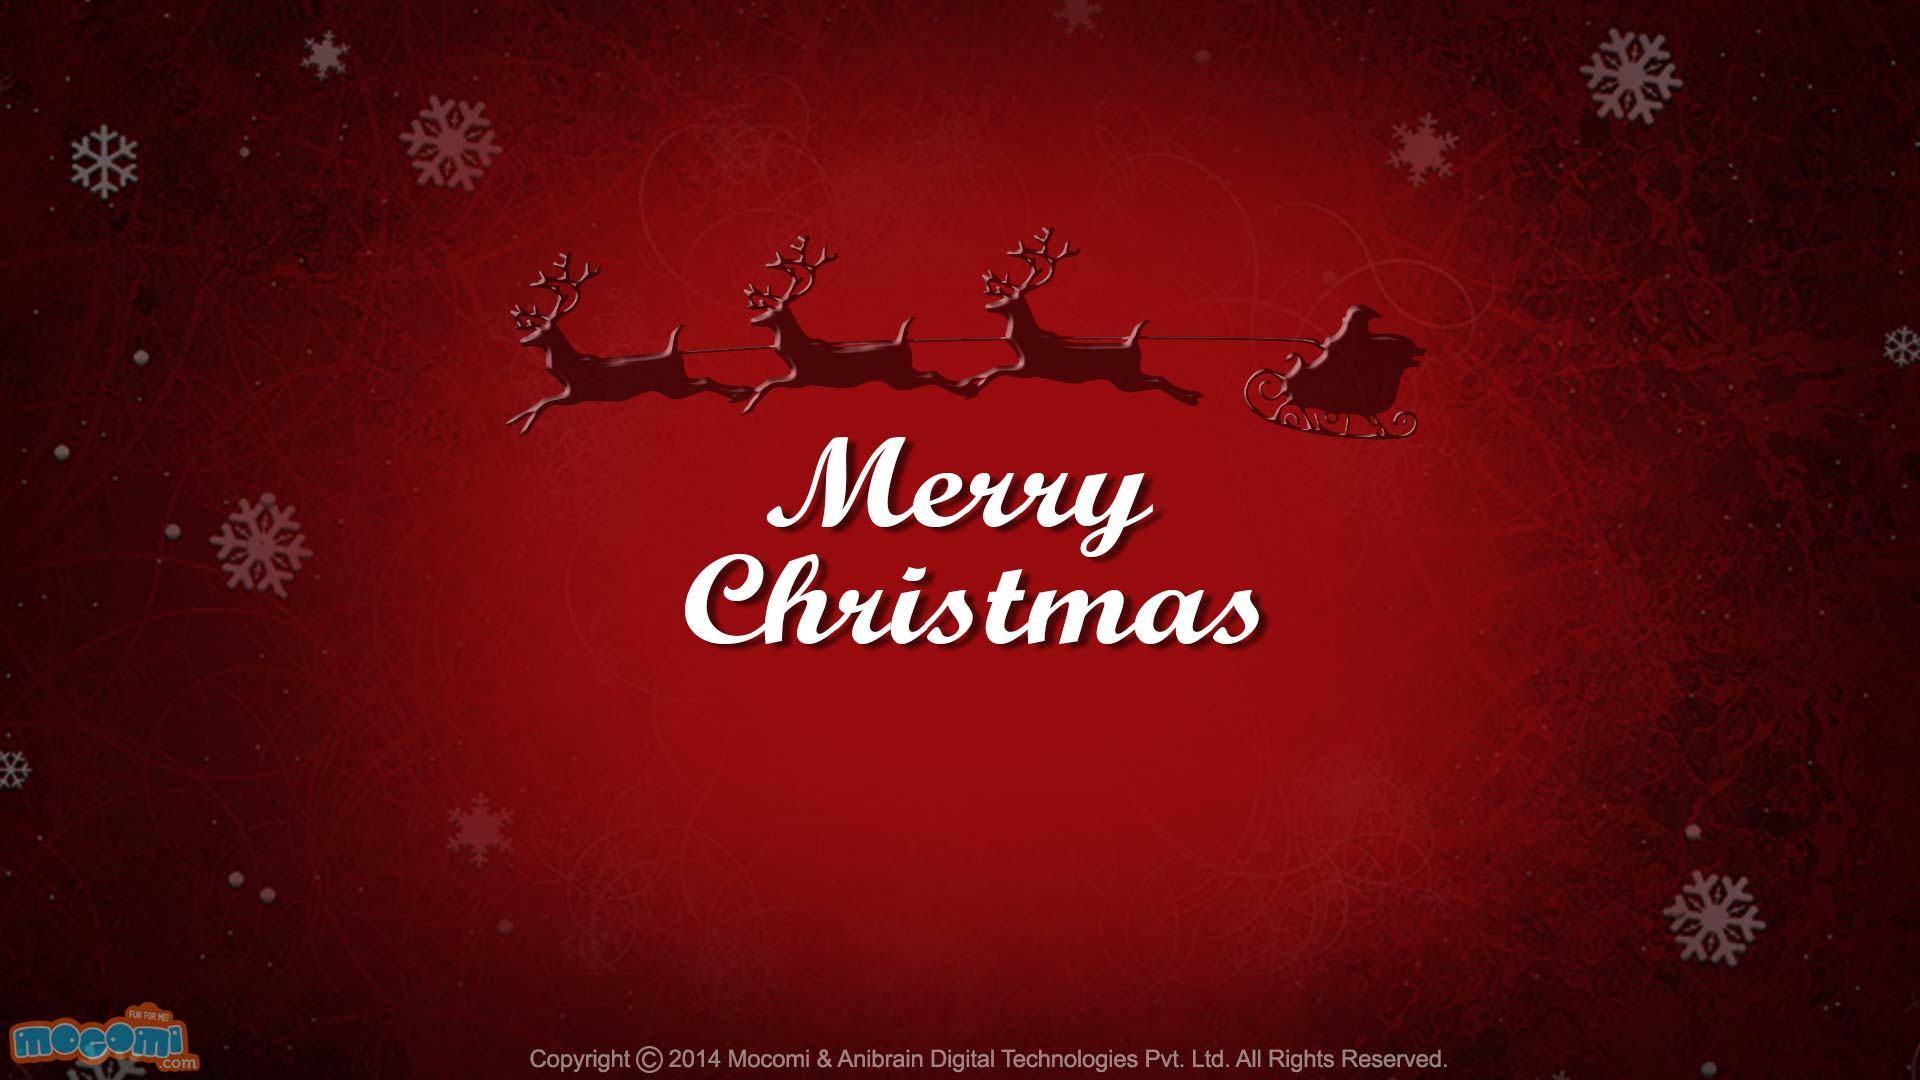 Merry Christmas- Santa's Sleigh 1